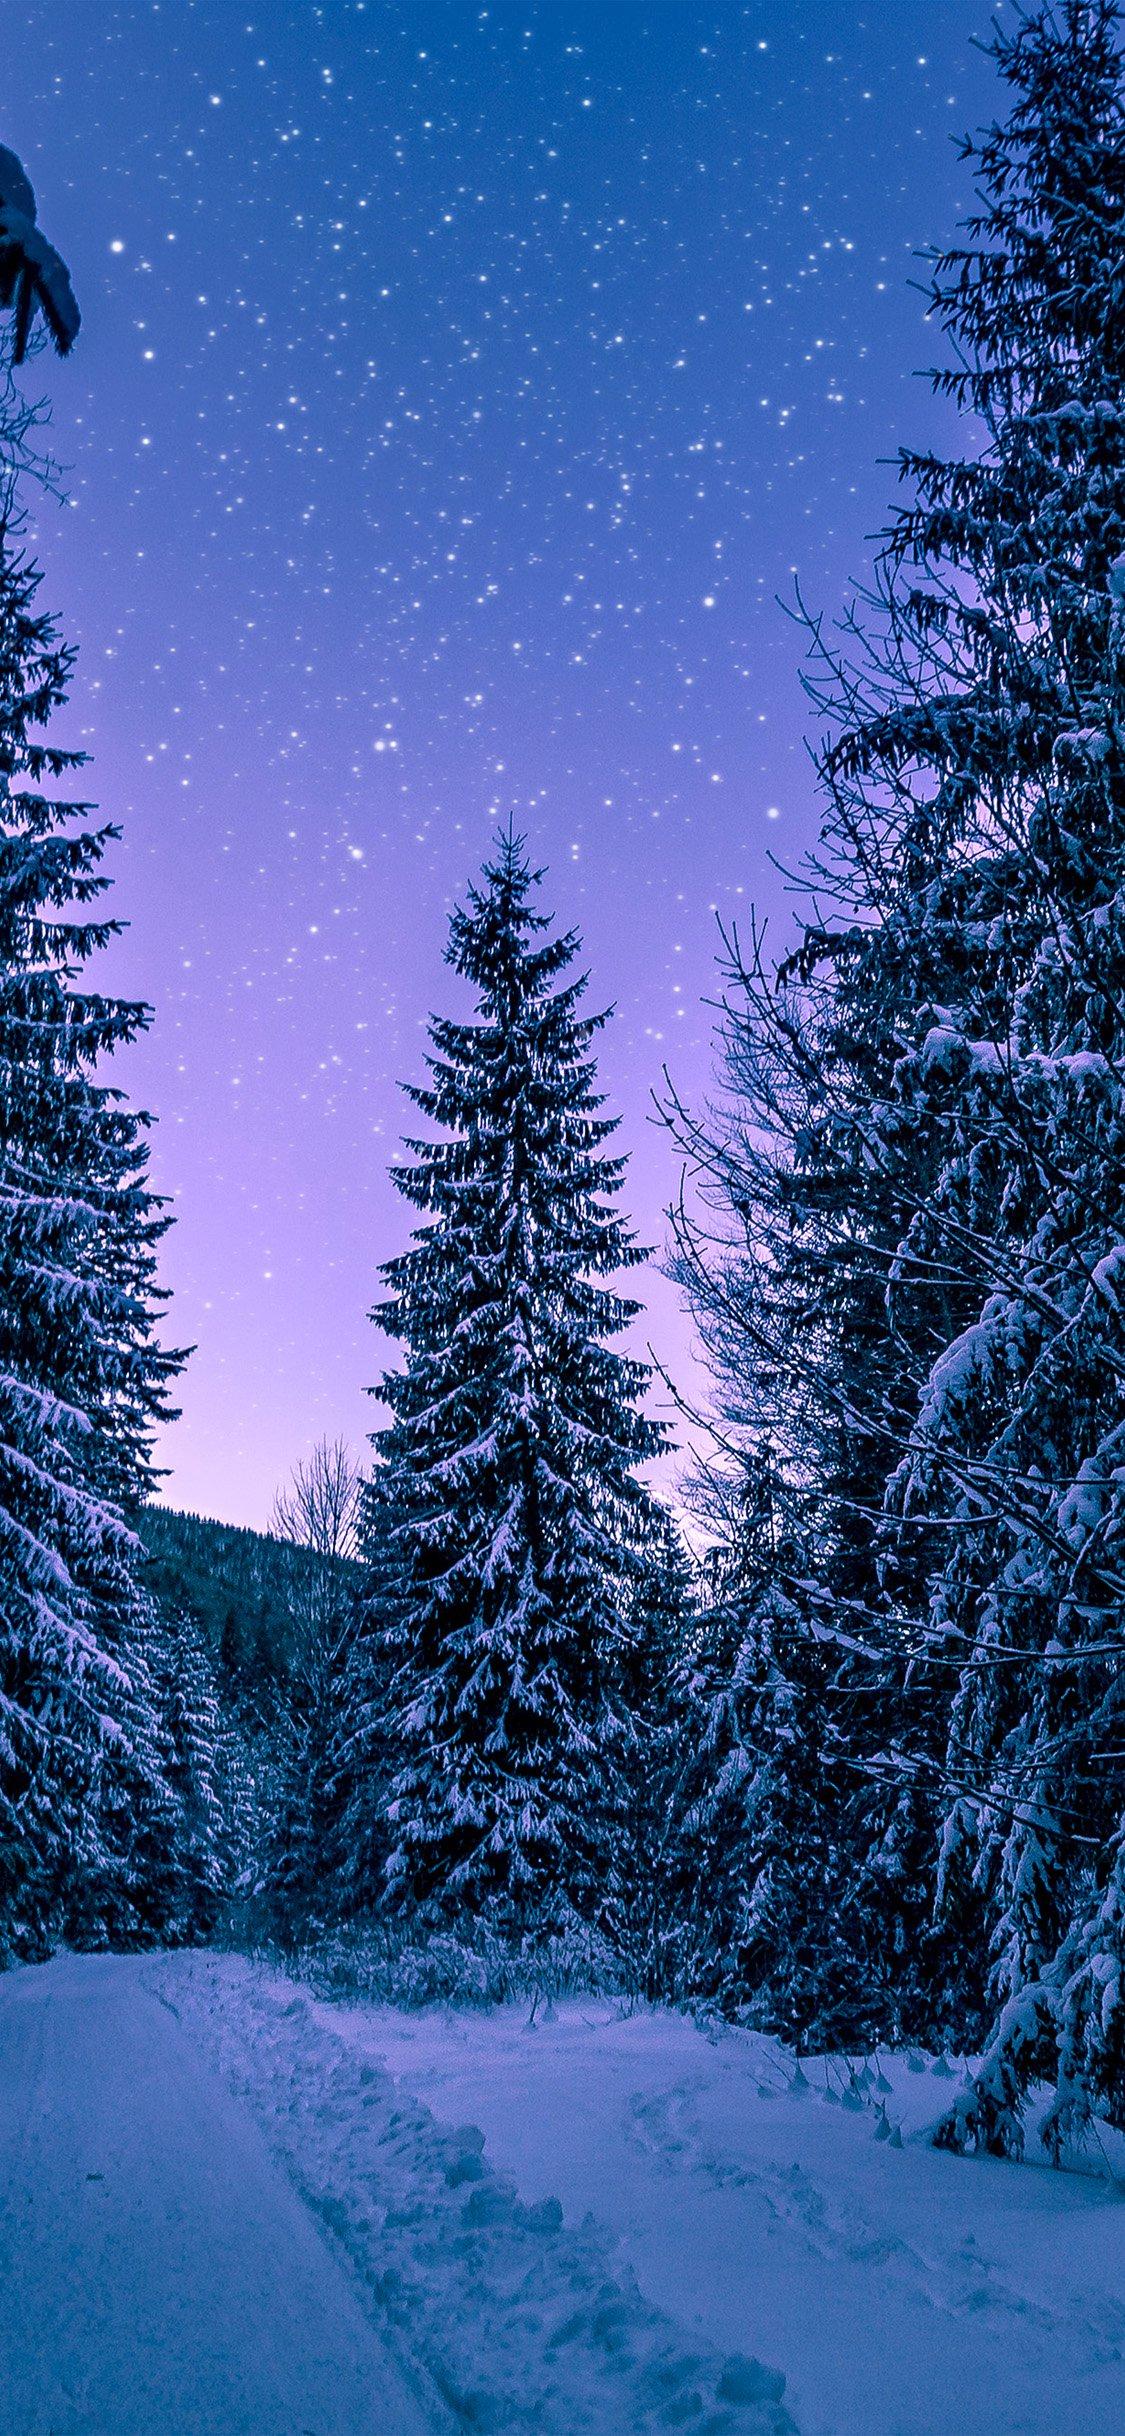 The Best Winter Wallpaper